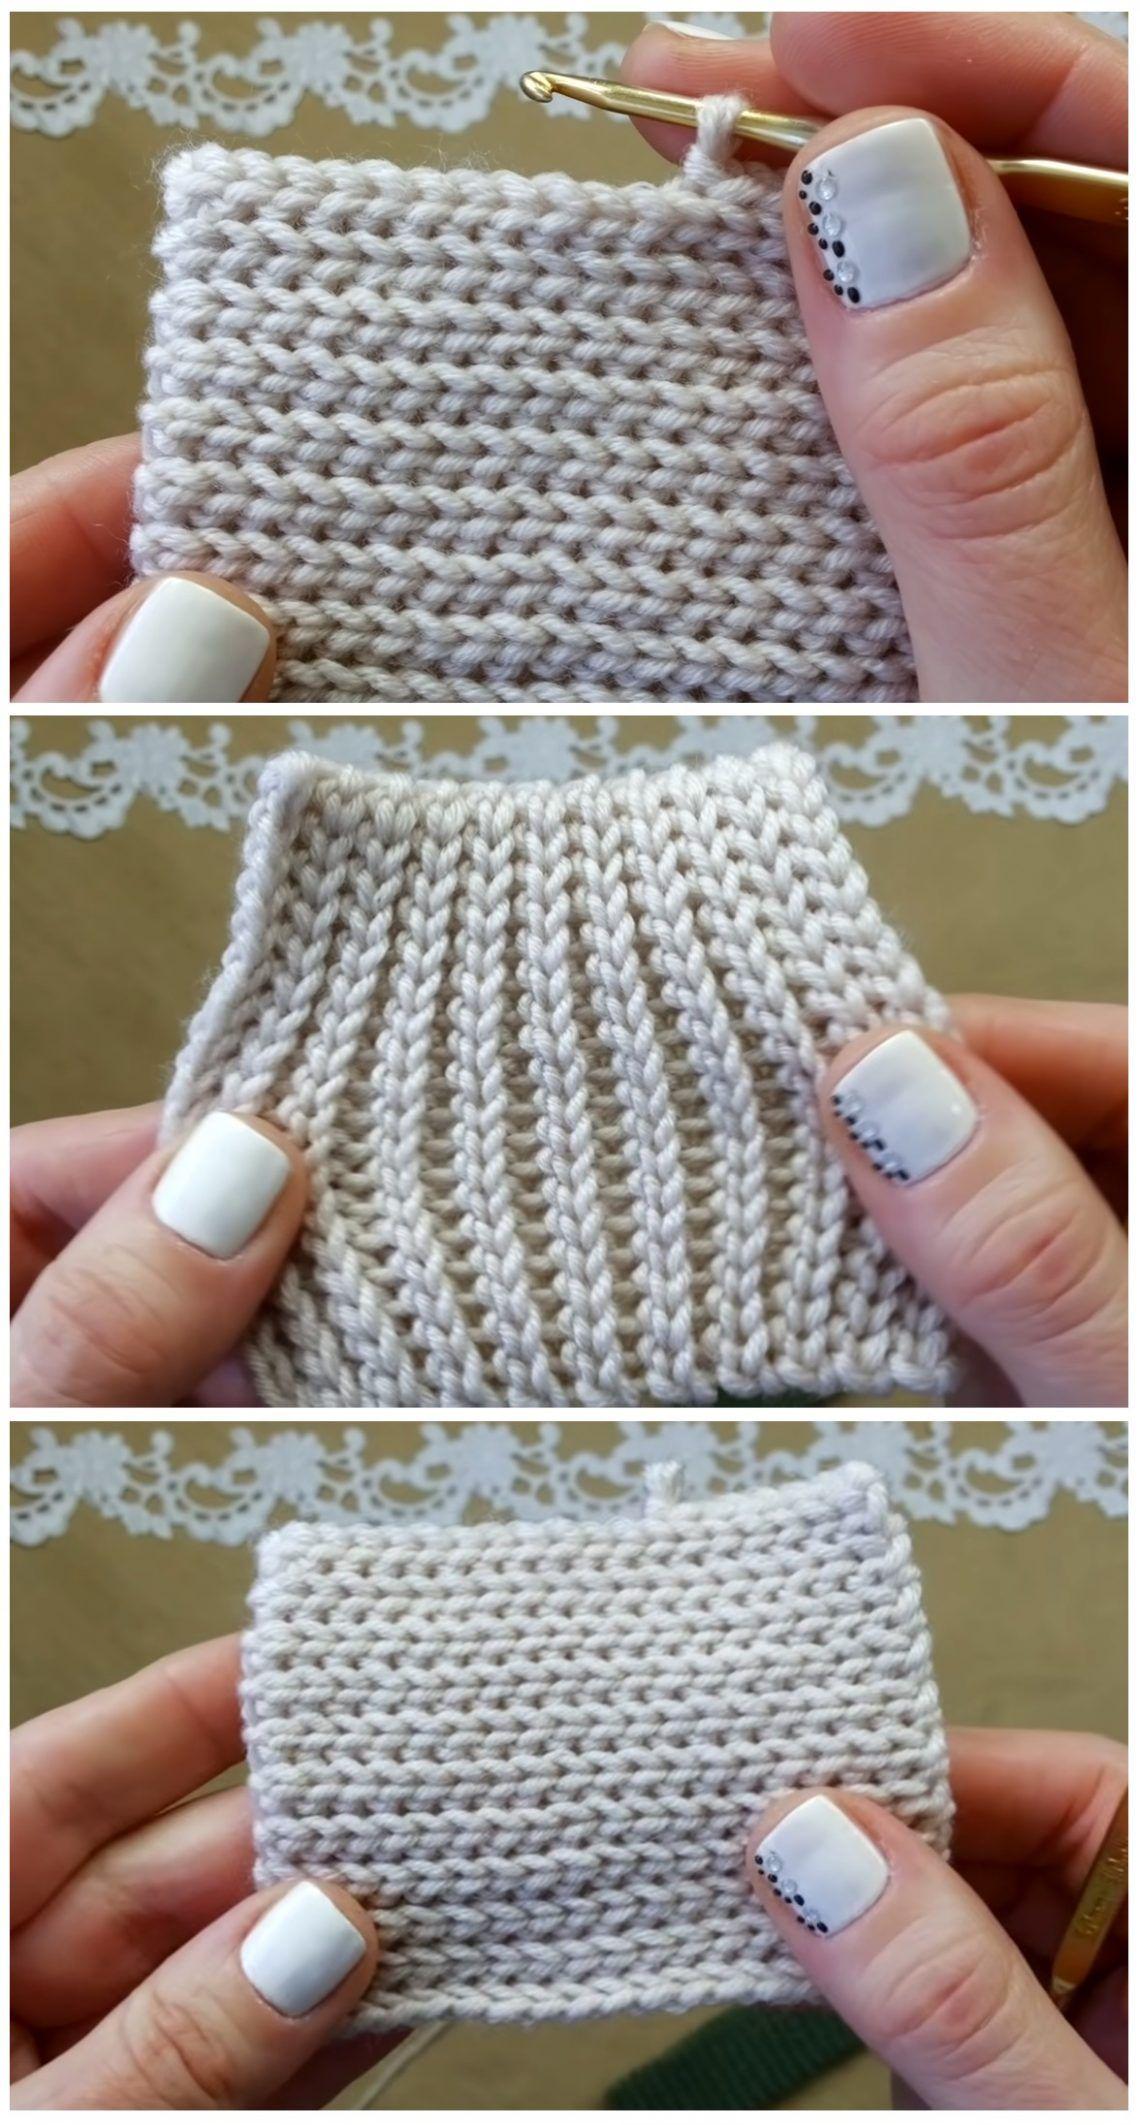 How to Crochet Fisherman's Stitch - Design Peak